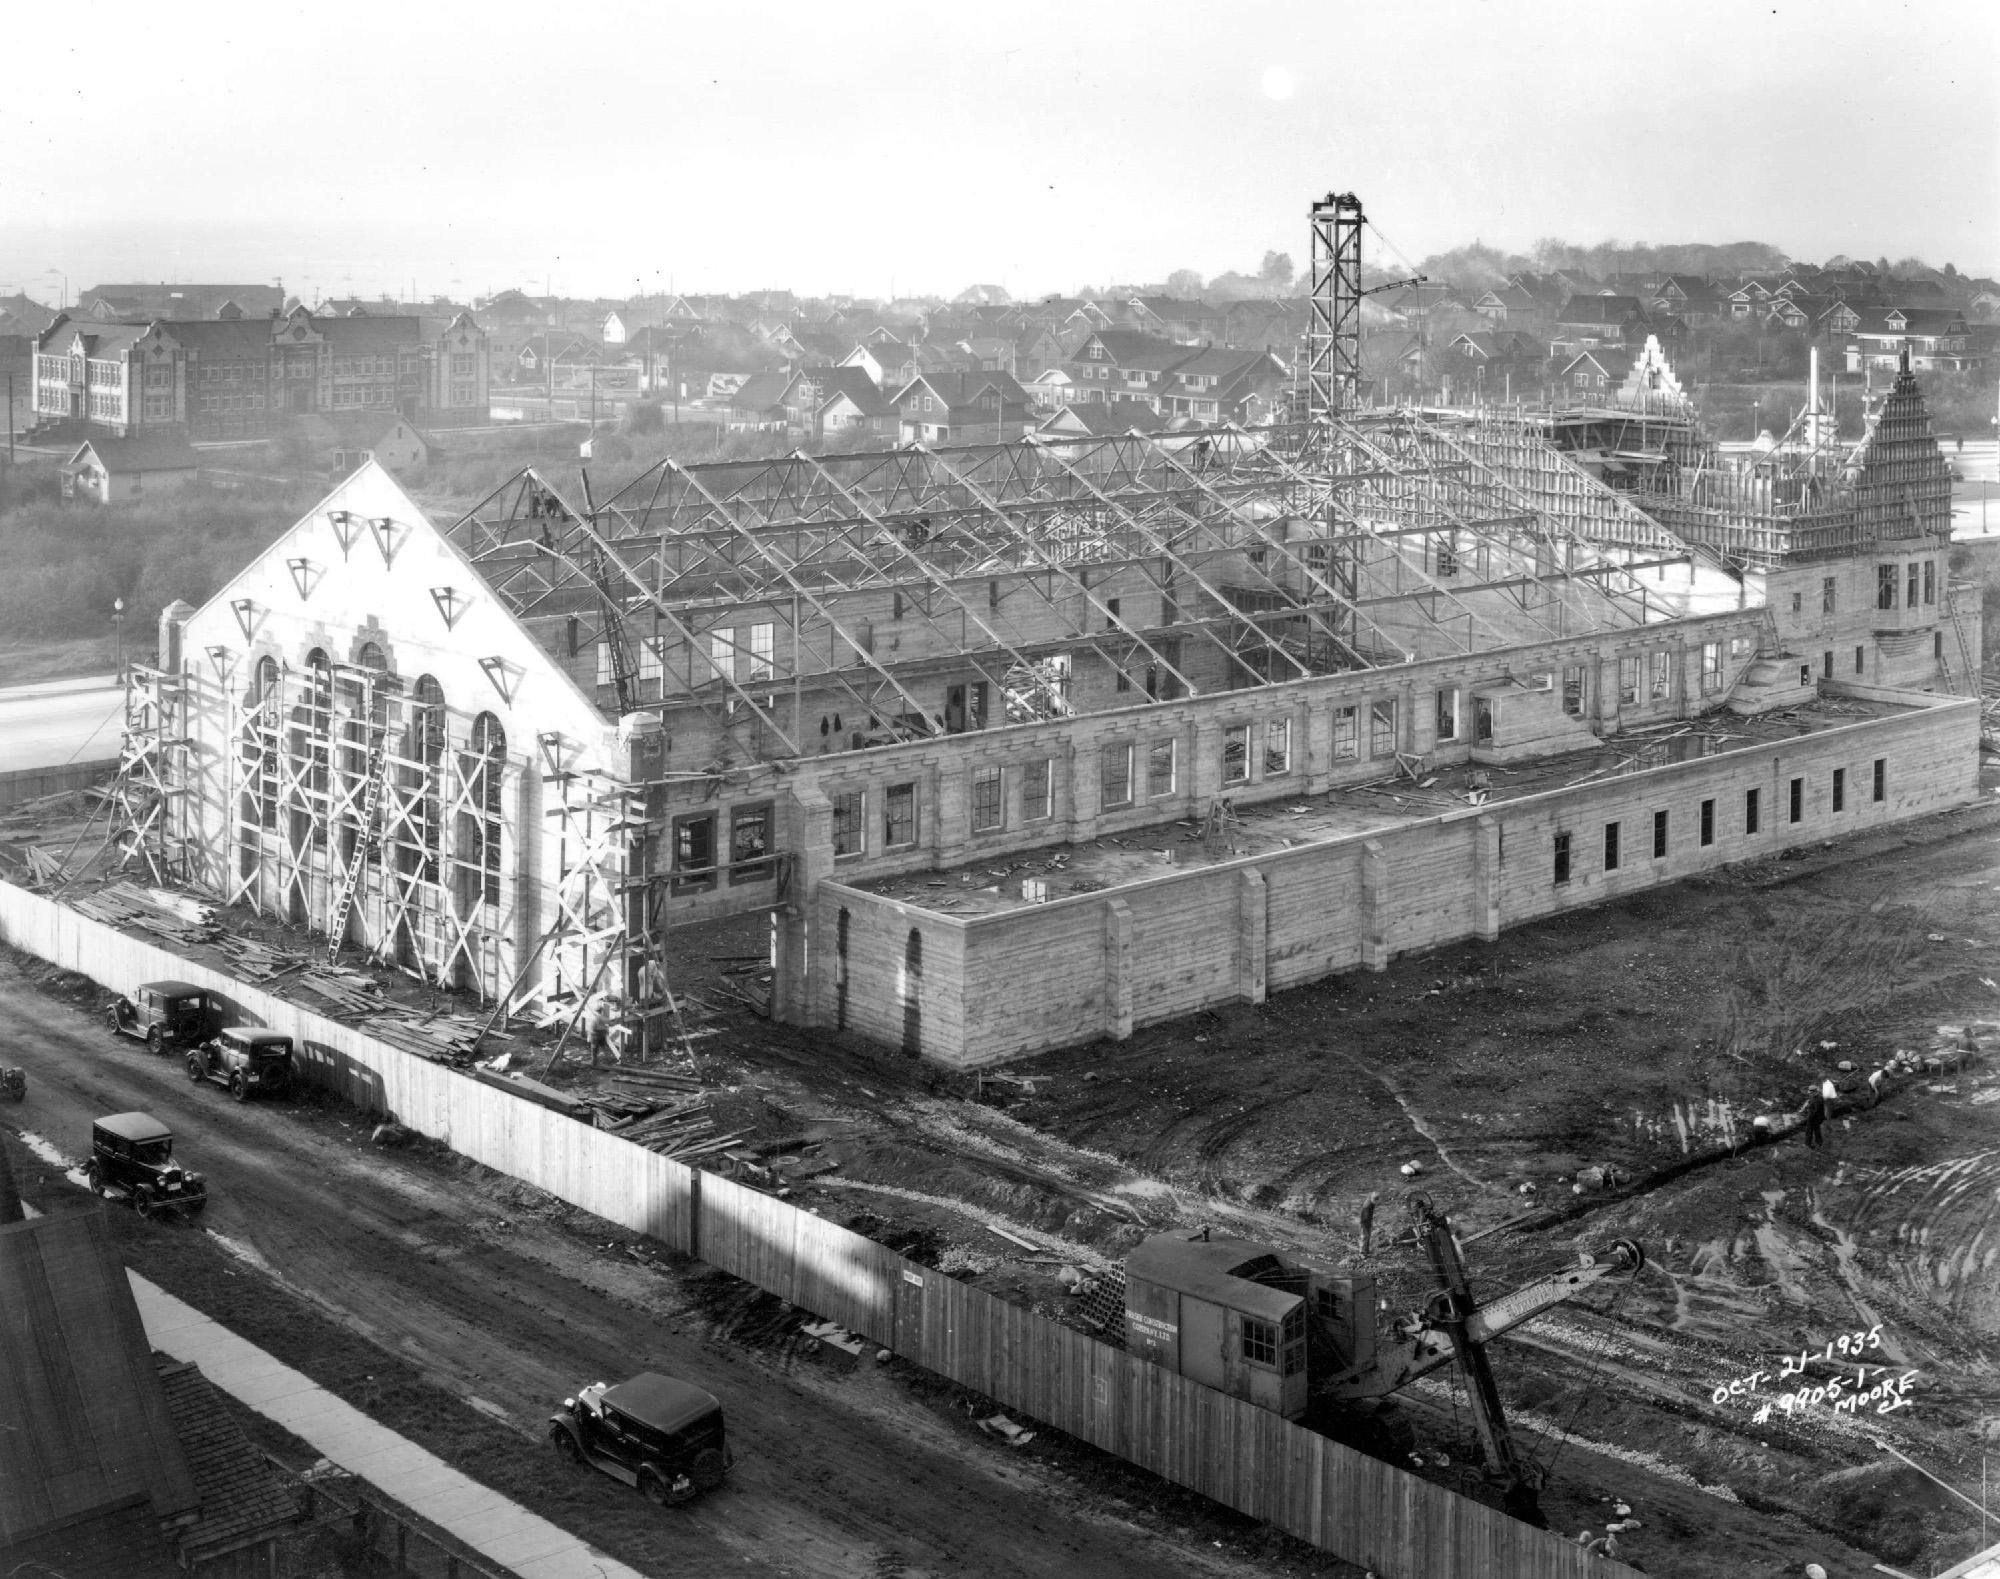 October 21st, 1935